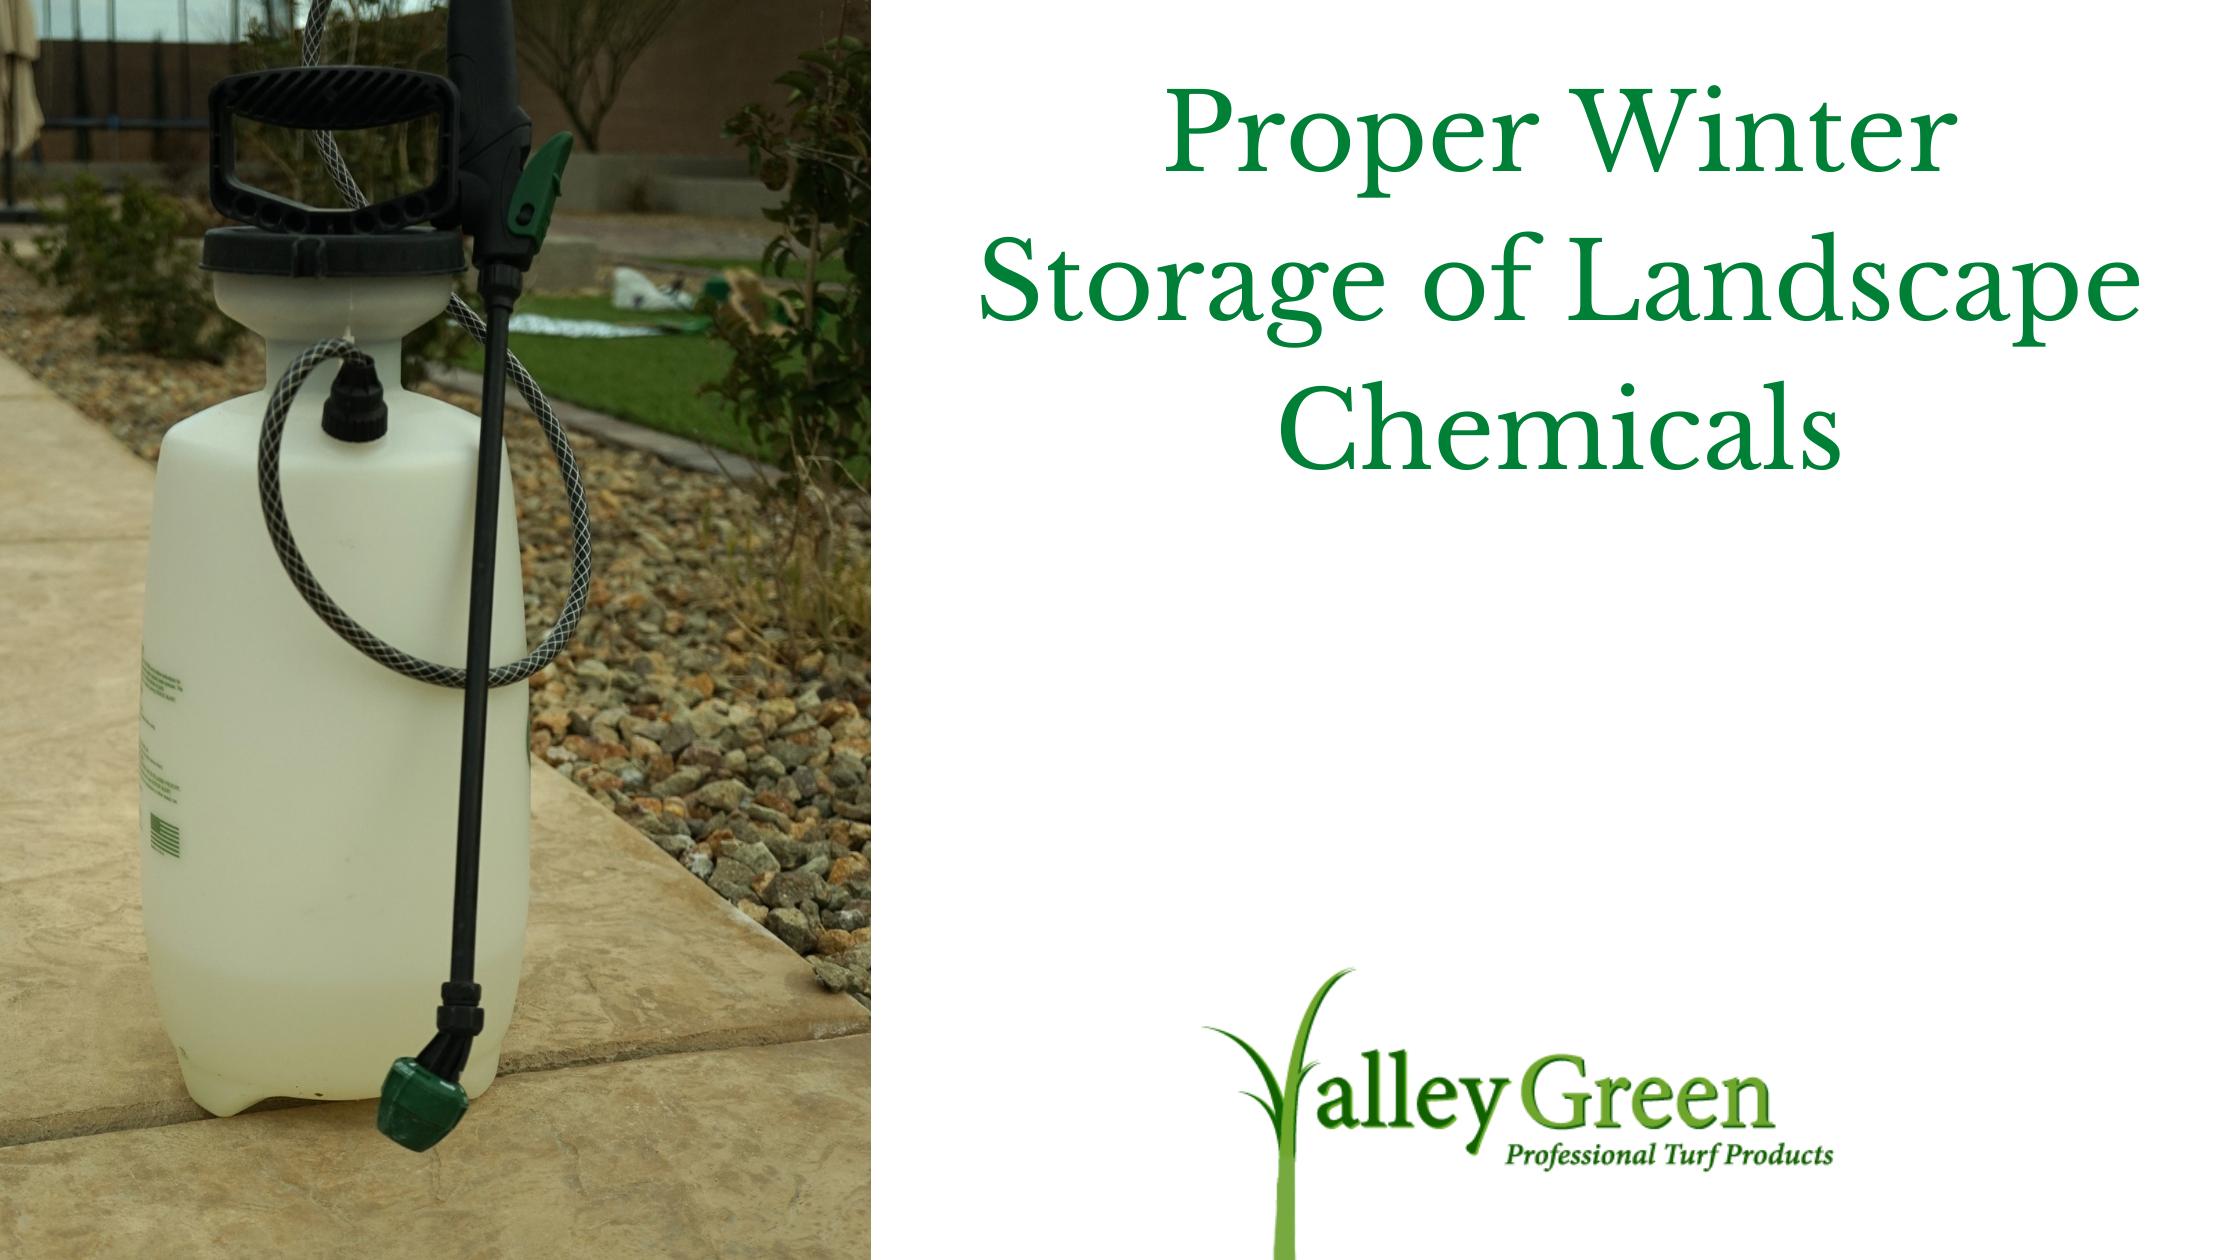 Proper Winter Storage of Landscape Chemicals